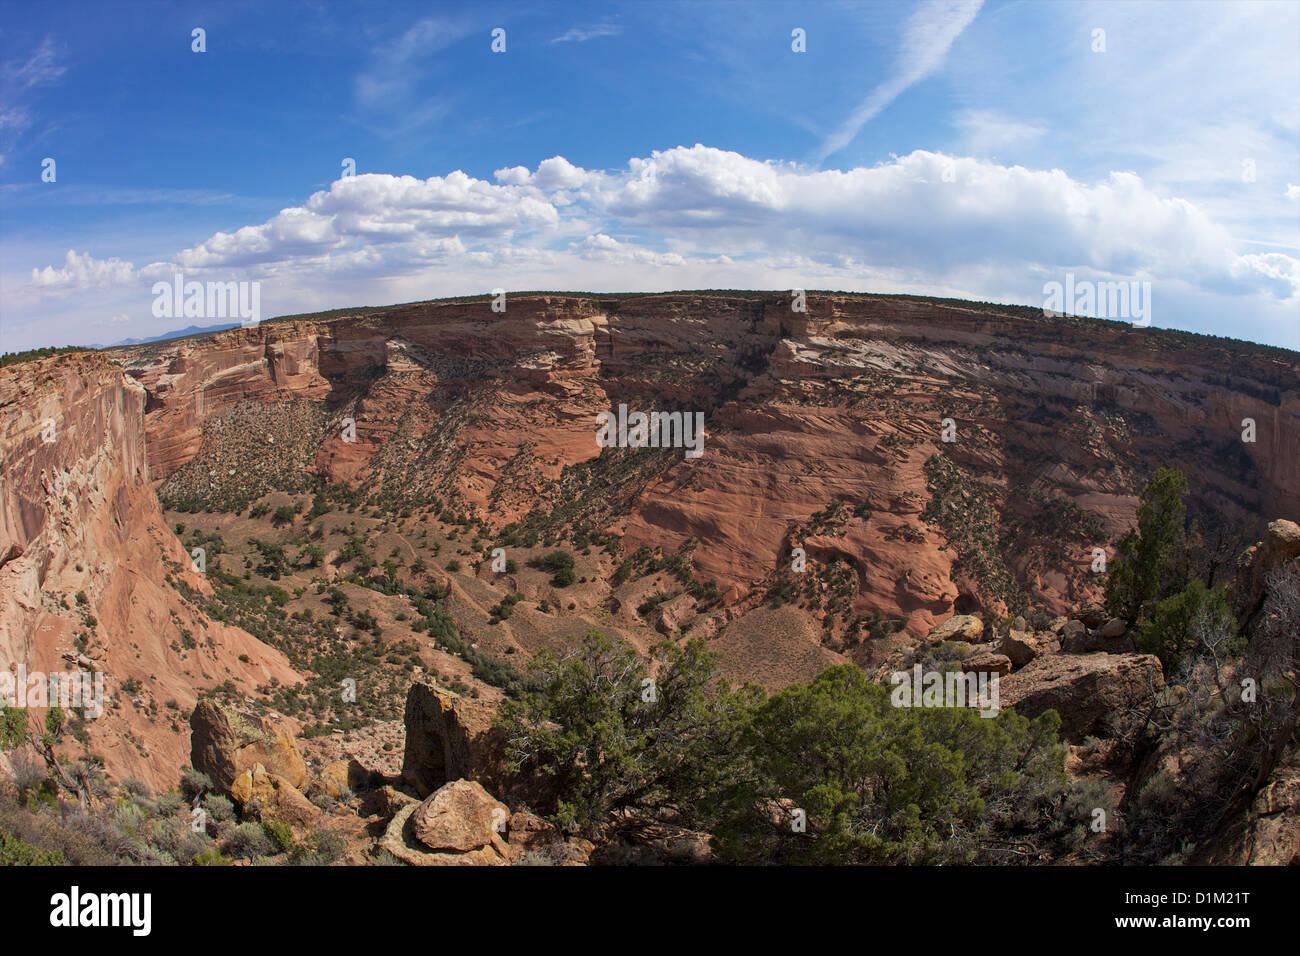 Massacre Cave Overlook, Canyon de Chelly National Monument, Arizona, USA - Stock Image